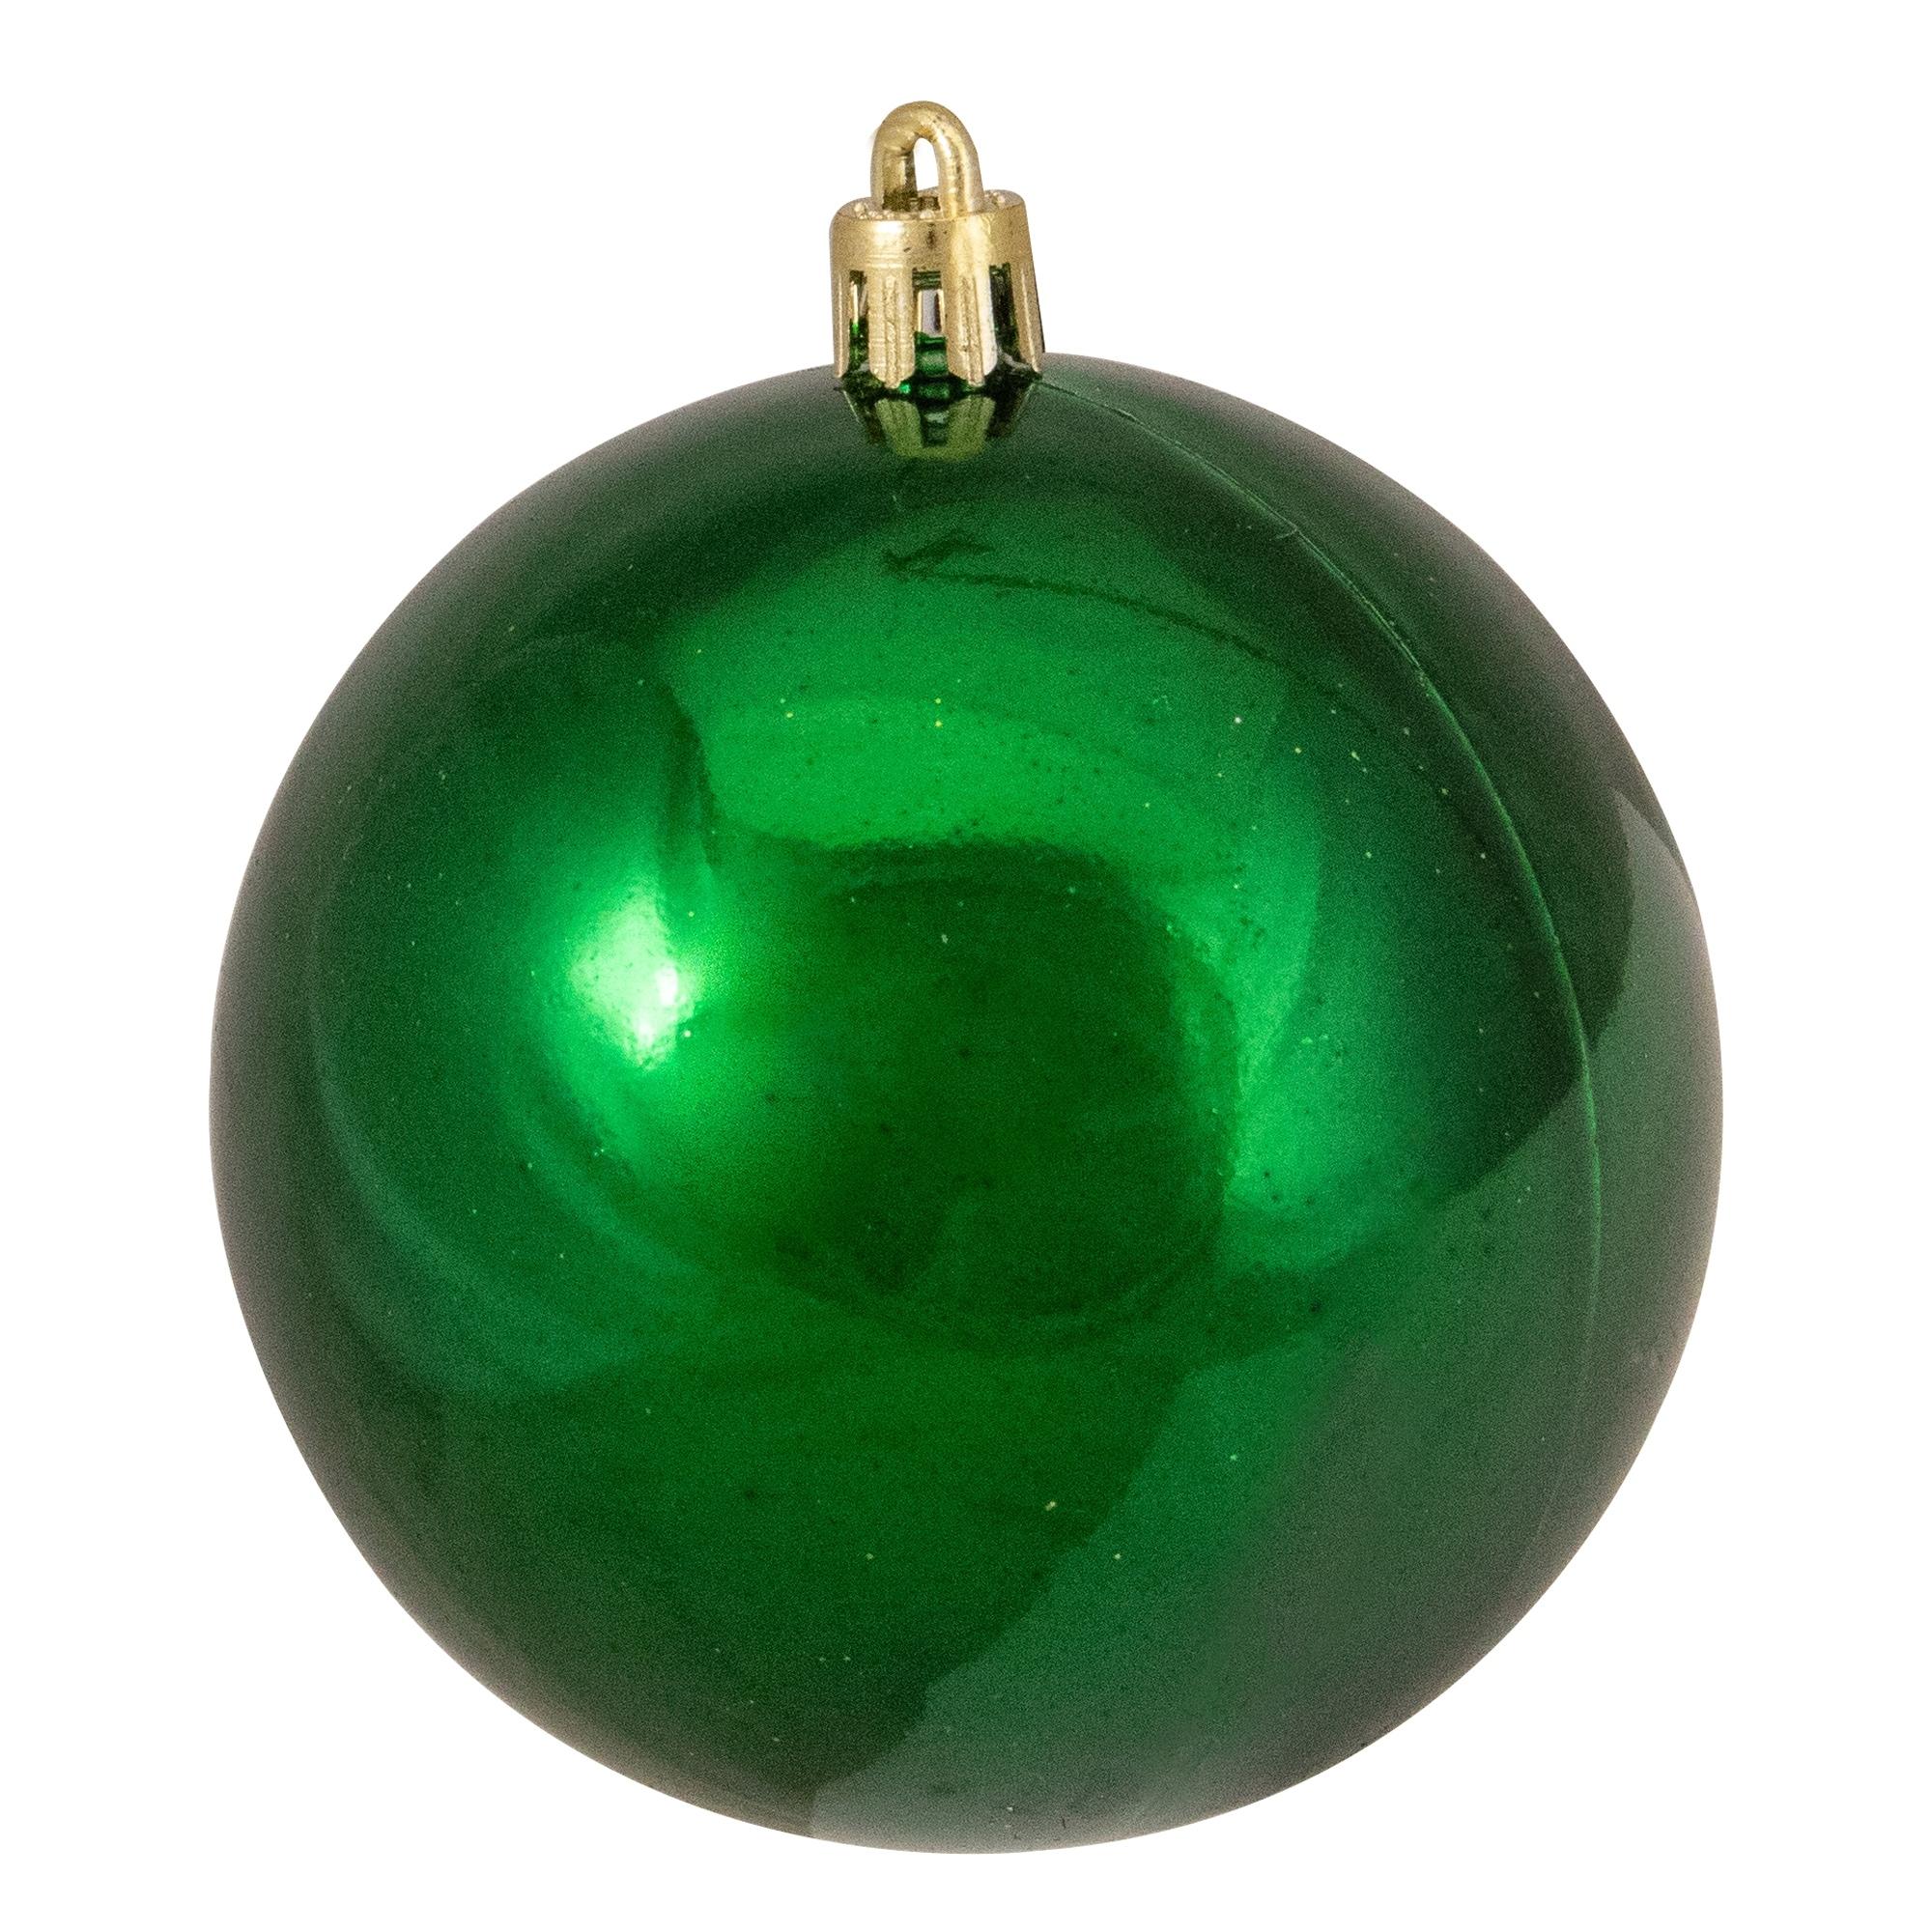 32ct Xmas Green Shatterproof 4 Finish Christmas Ball Ornaments 3 25 Overstock 16551062